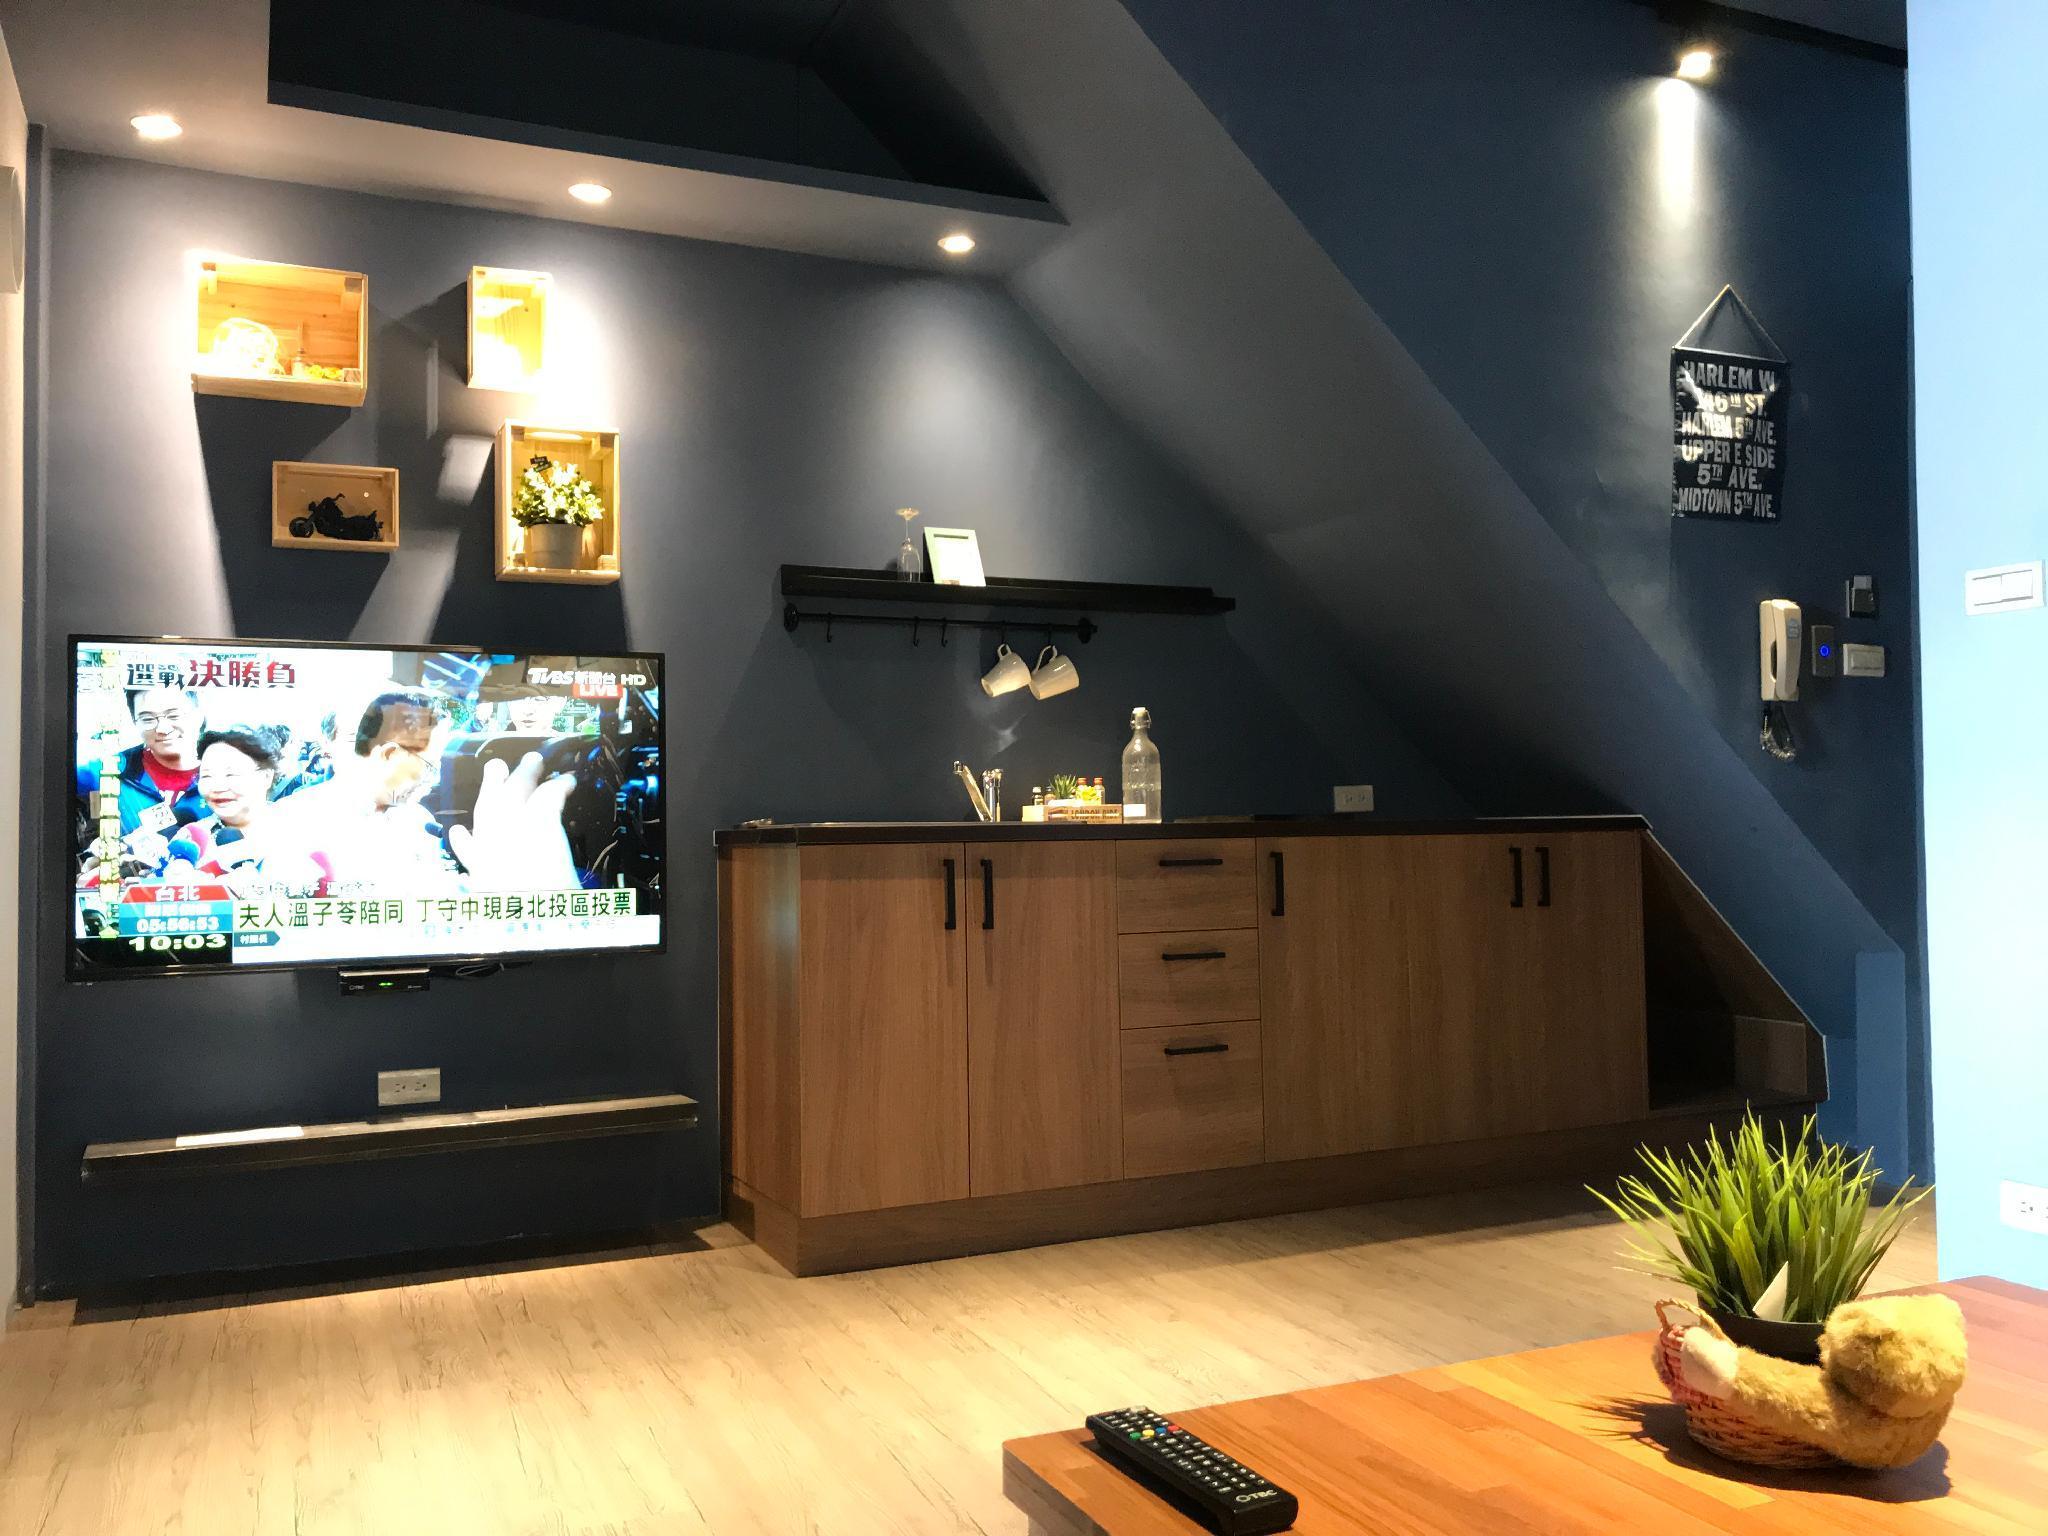 Designer's Home Zhuang Jing 21C